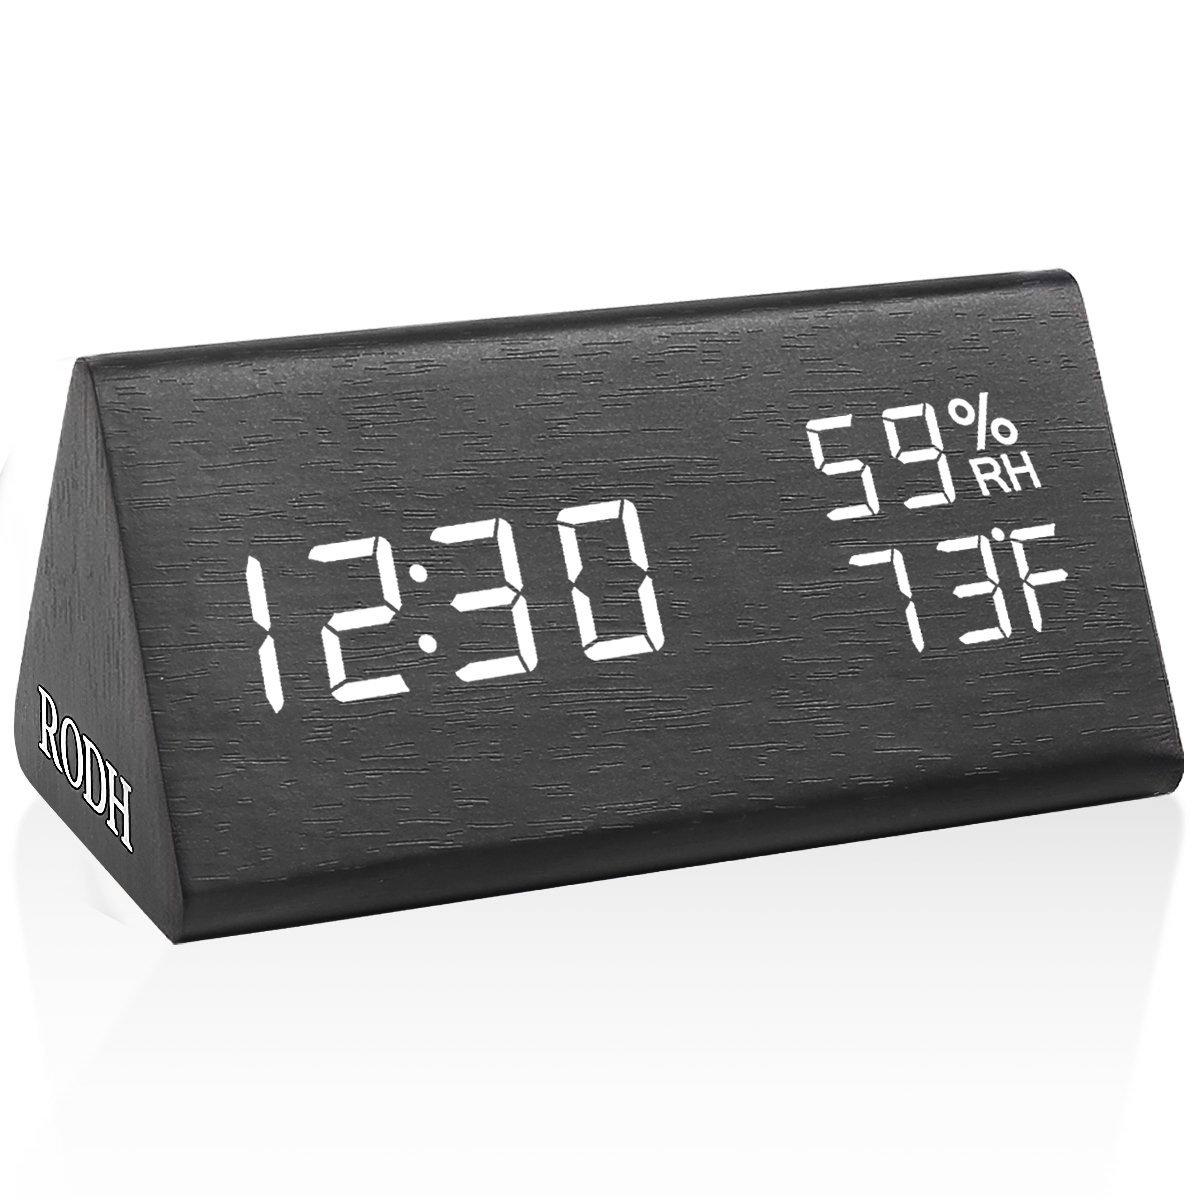 RODH Digital Wood Alarm Clock Wooden Led Light Minimalist Large Display with Humidity Temperature for Bedroom - Black